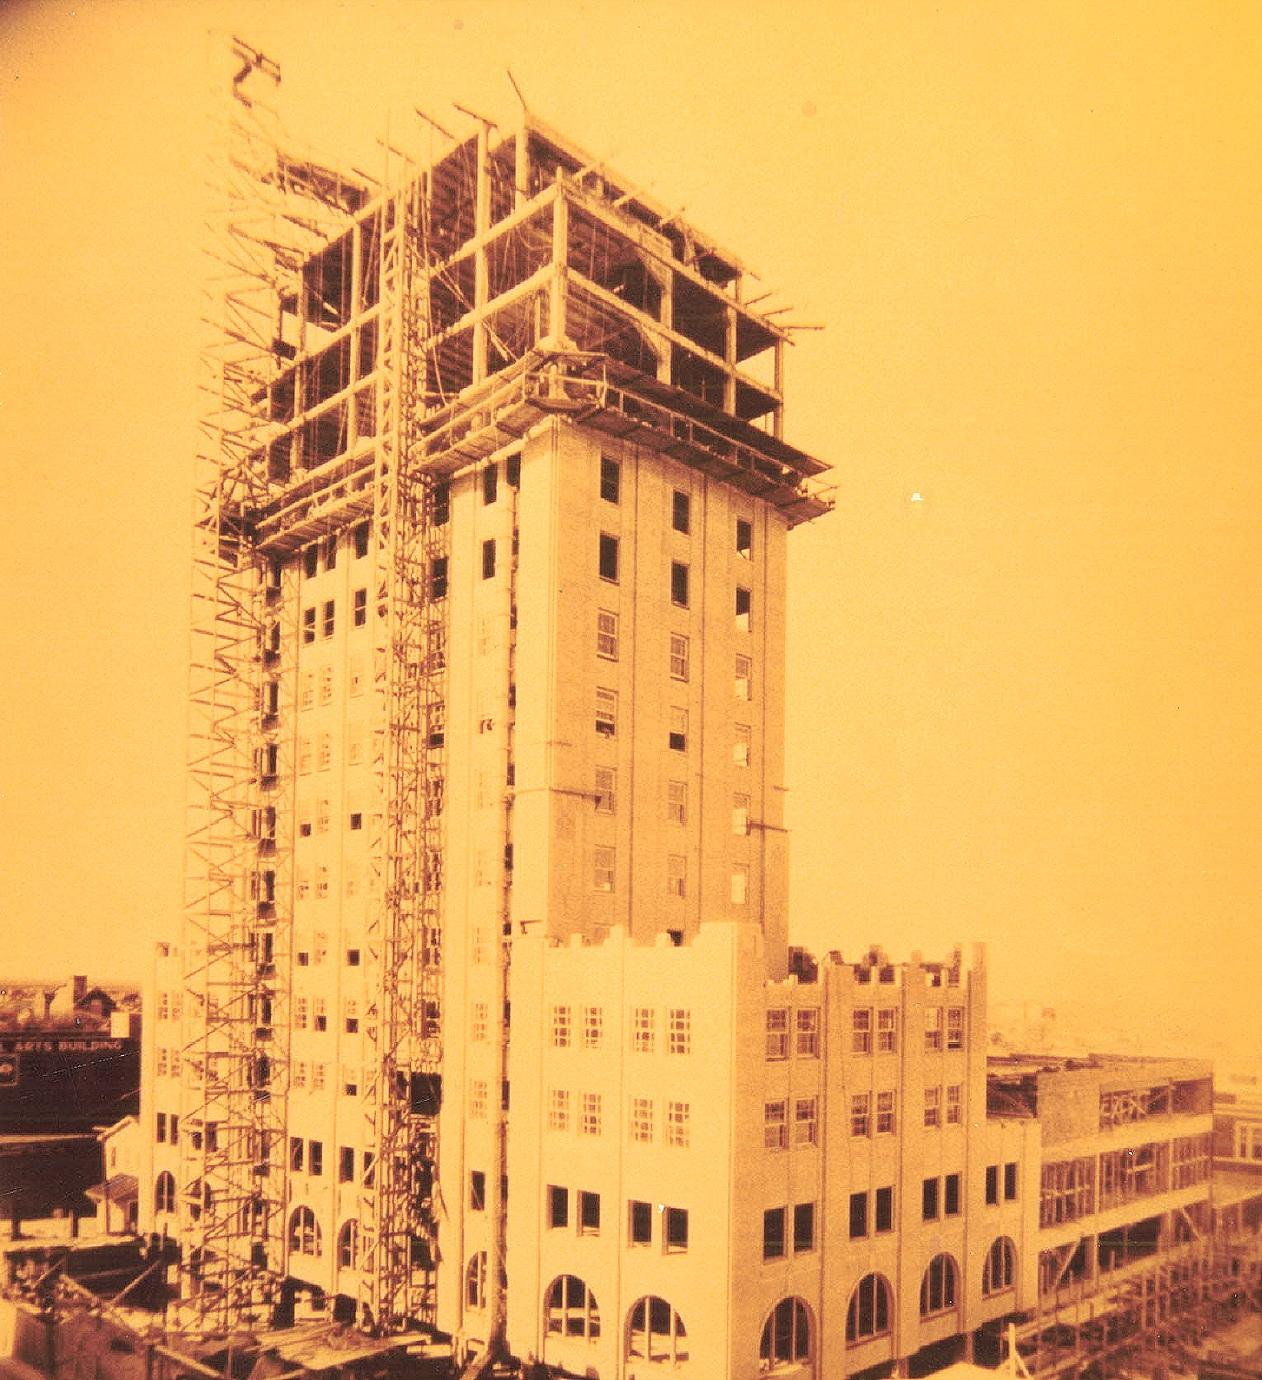 Wooten hotel construction (1929)